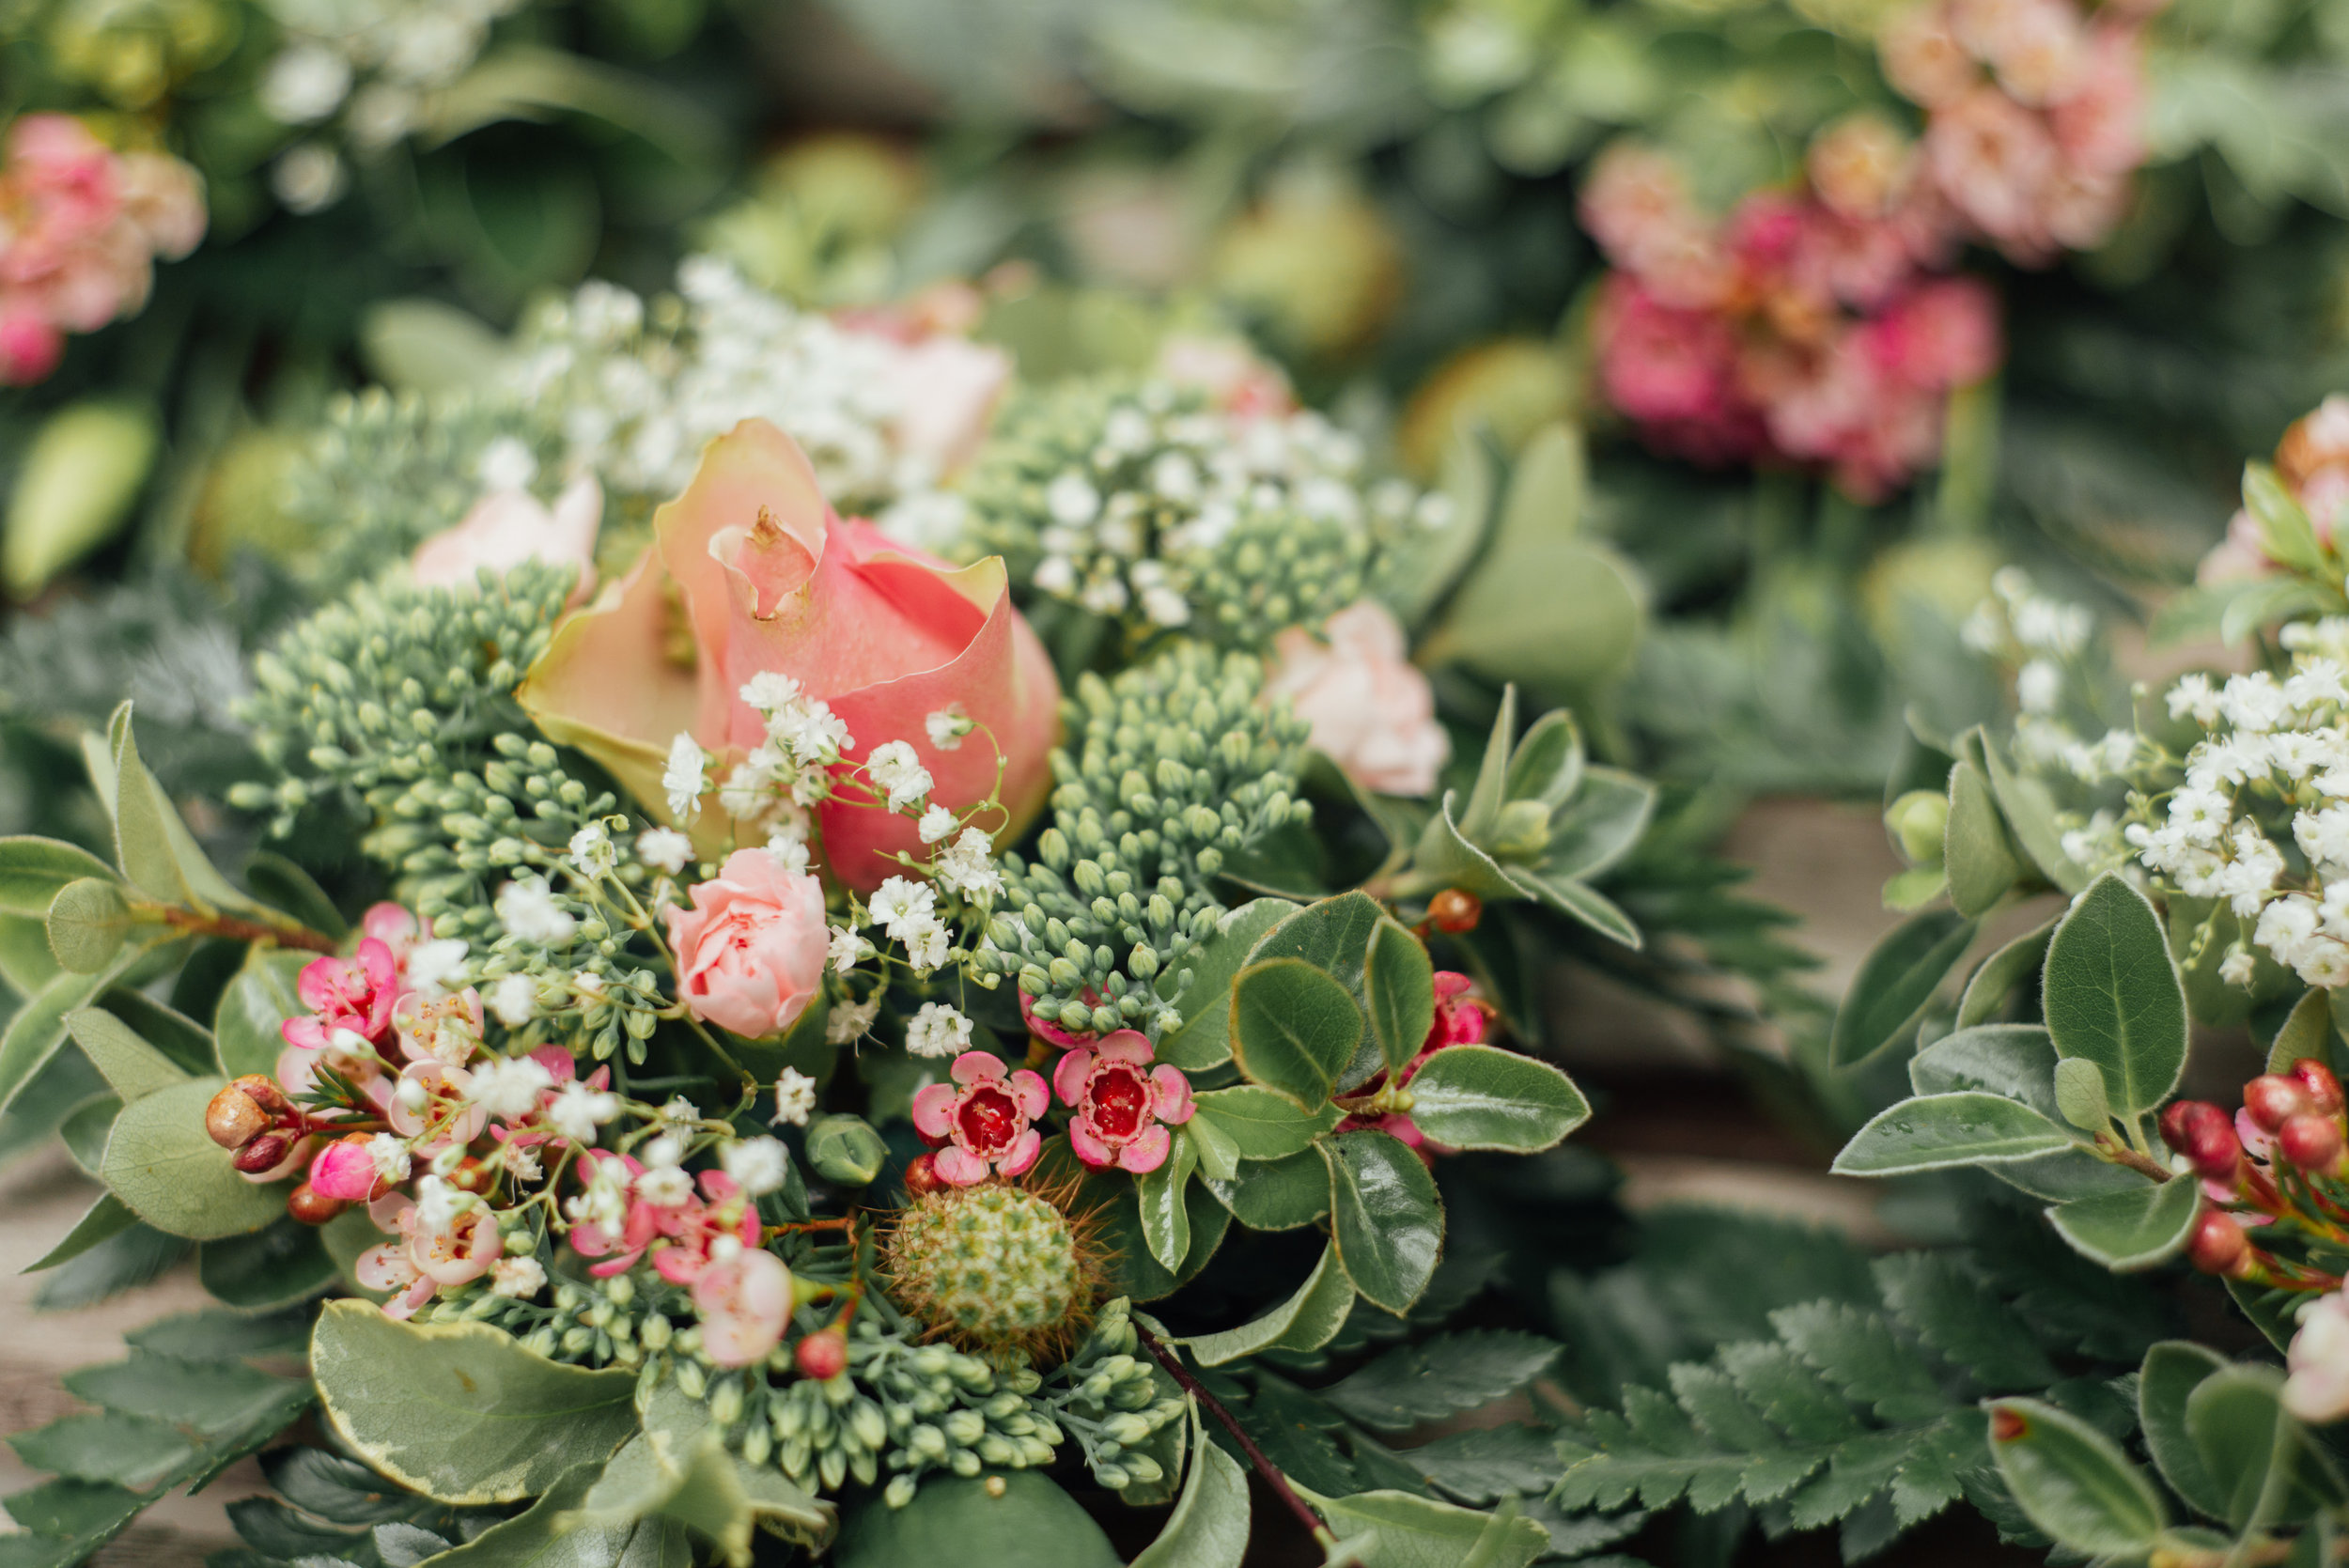 cleland-studios-wedding-photography-1.jpg